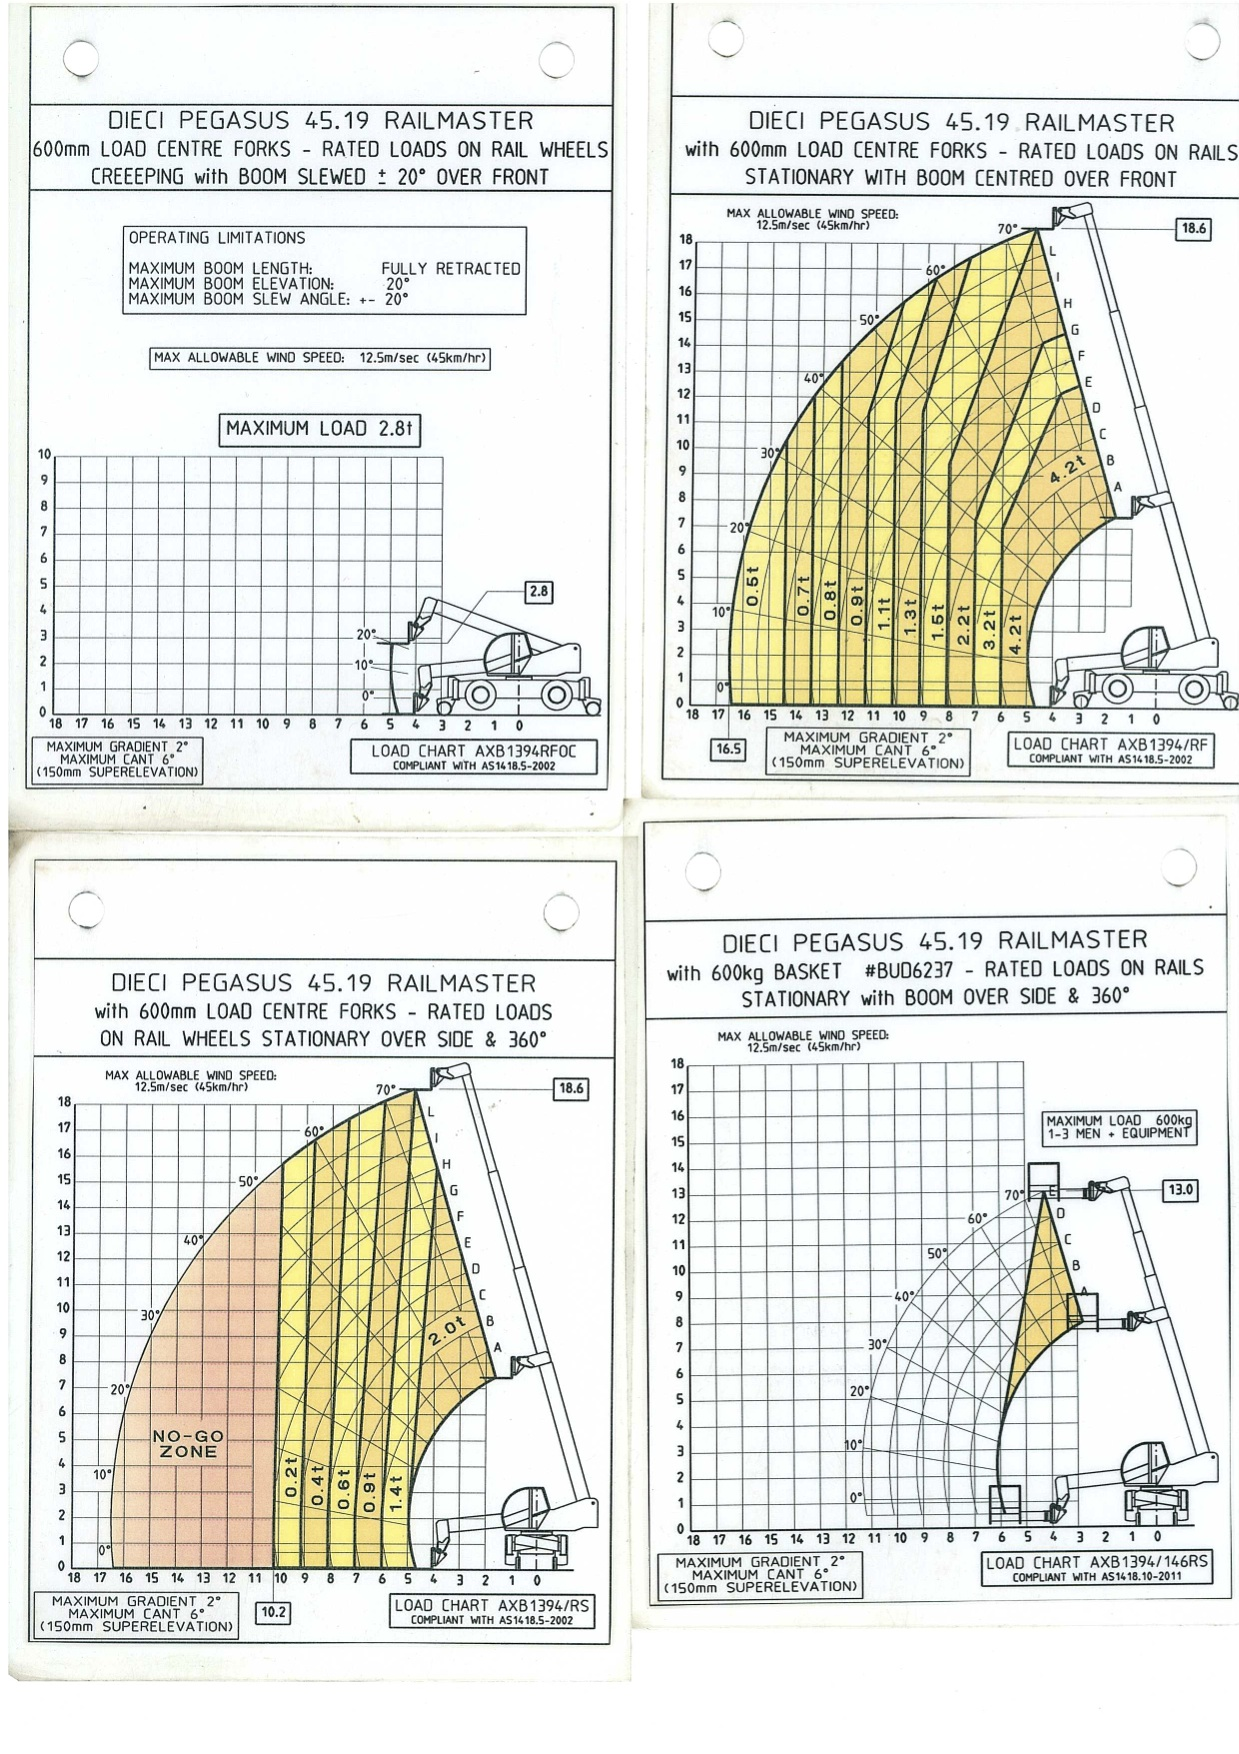 58577D-Dieci-PEGASUS-RAIL-MASTER-Telehandler-Load-Charts-2.jpg